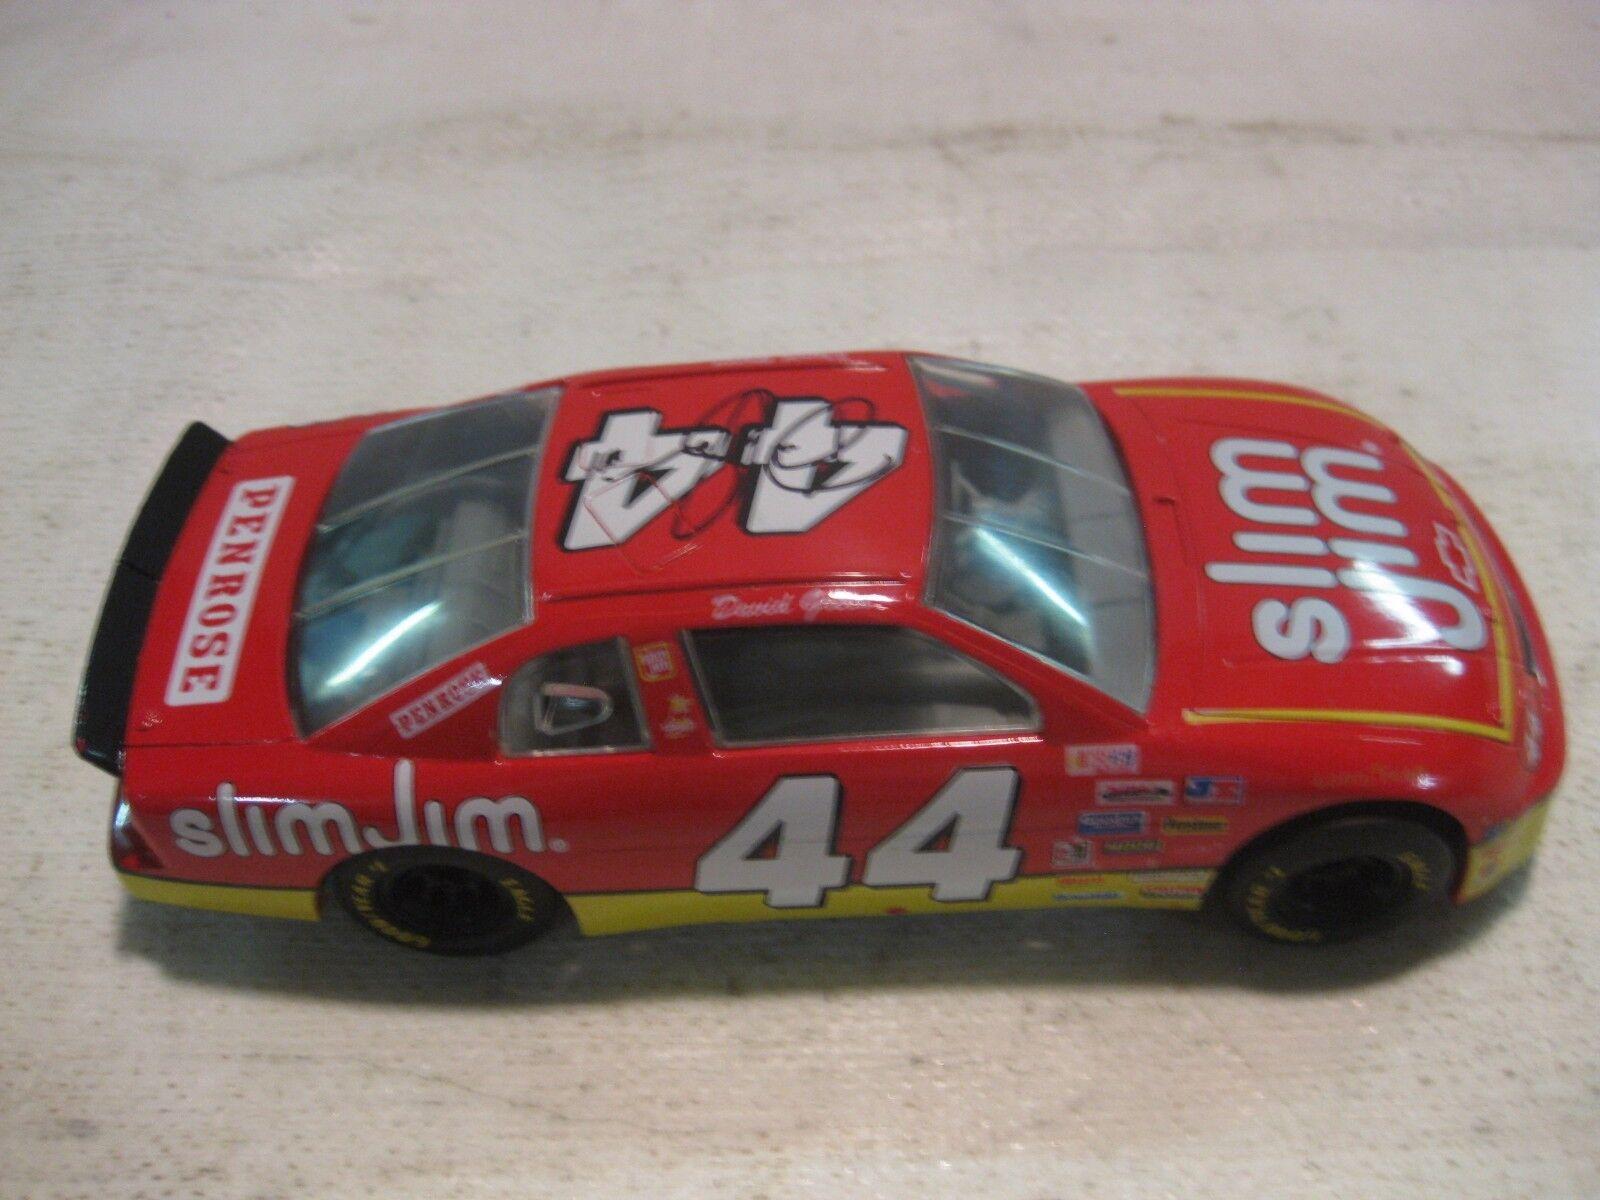 Nascar David Green Slim Jim Chevy Monte Carlo 124 Scale Diecast 1996   dc683